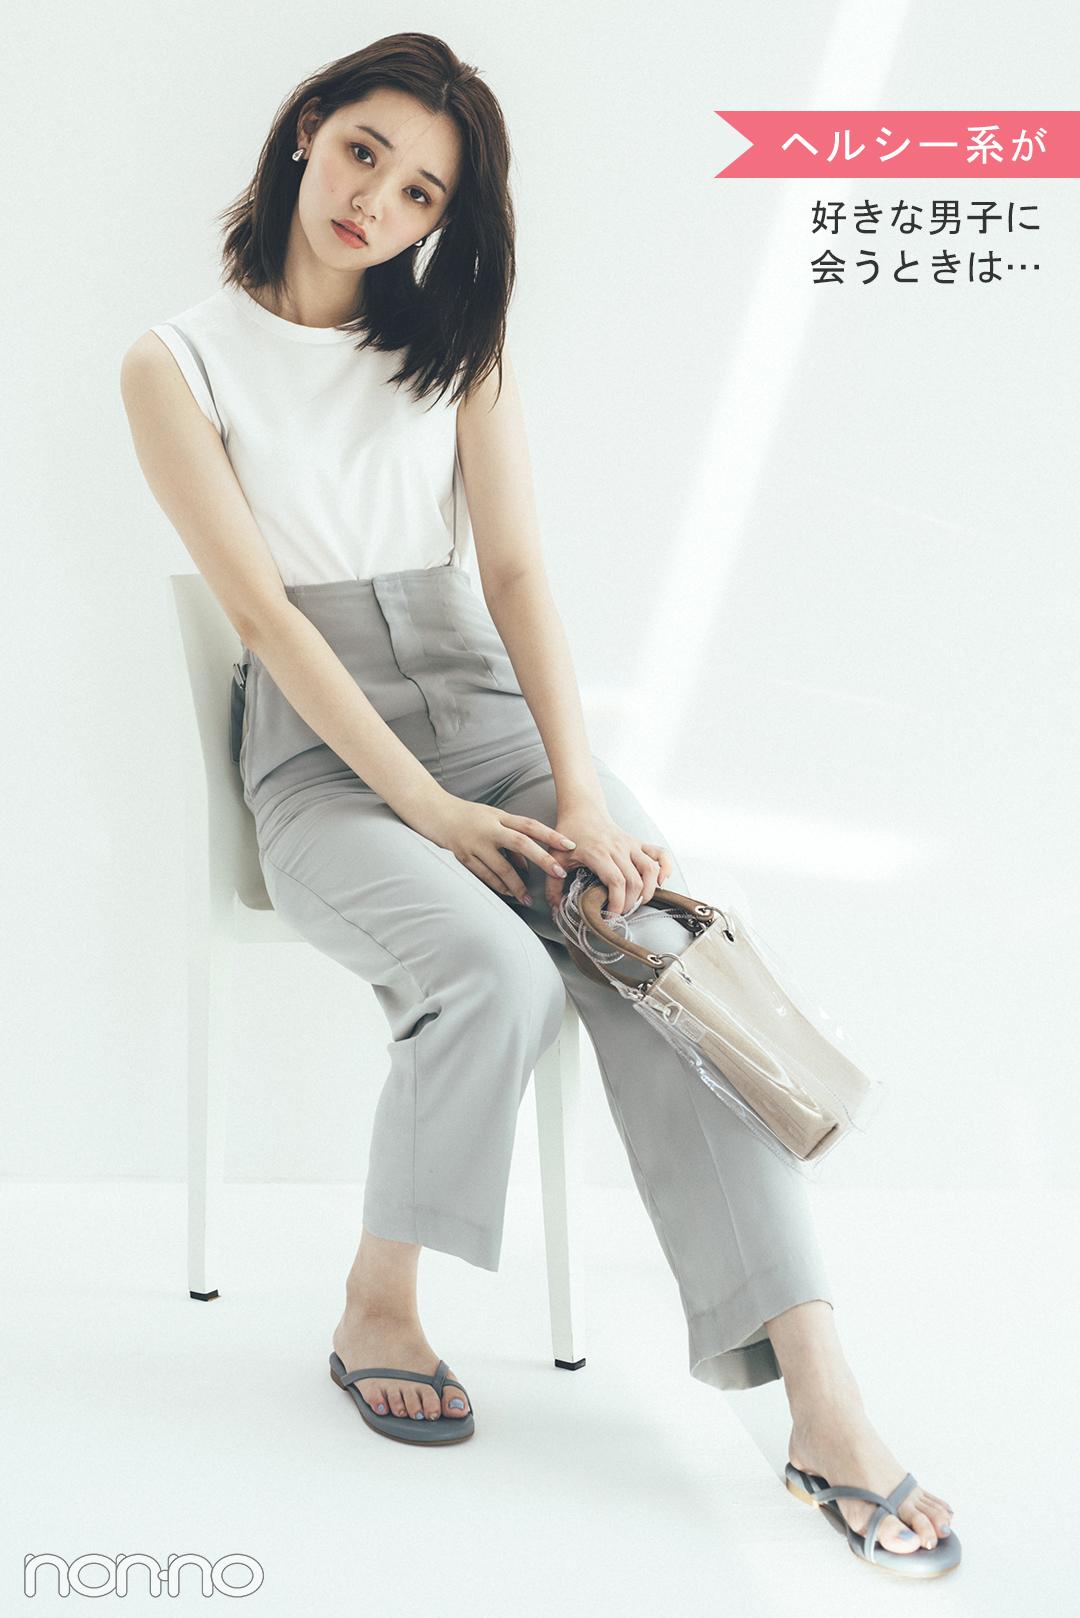 ITEM3 夏に最適♡ カジュアルで 元気な印象高まるカットソー素材 「ヘルシー系」が好きな男子に会う時は  江野沢愛美